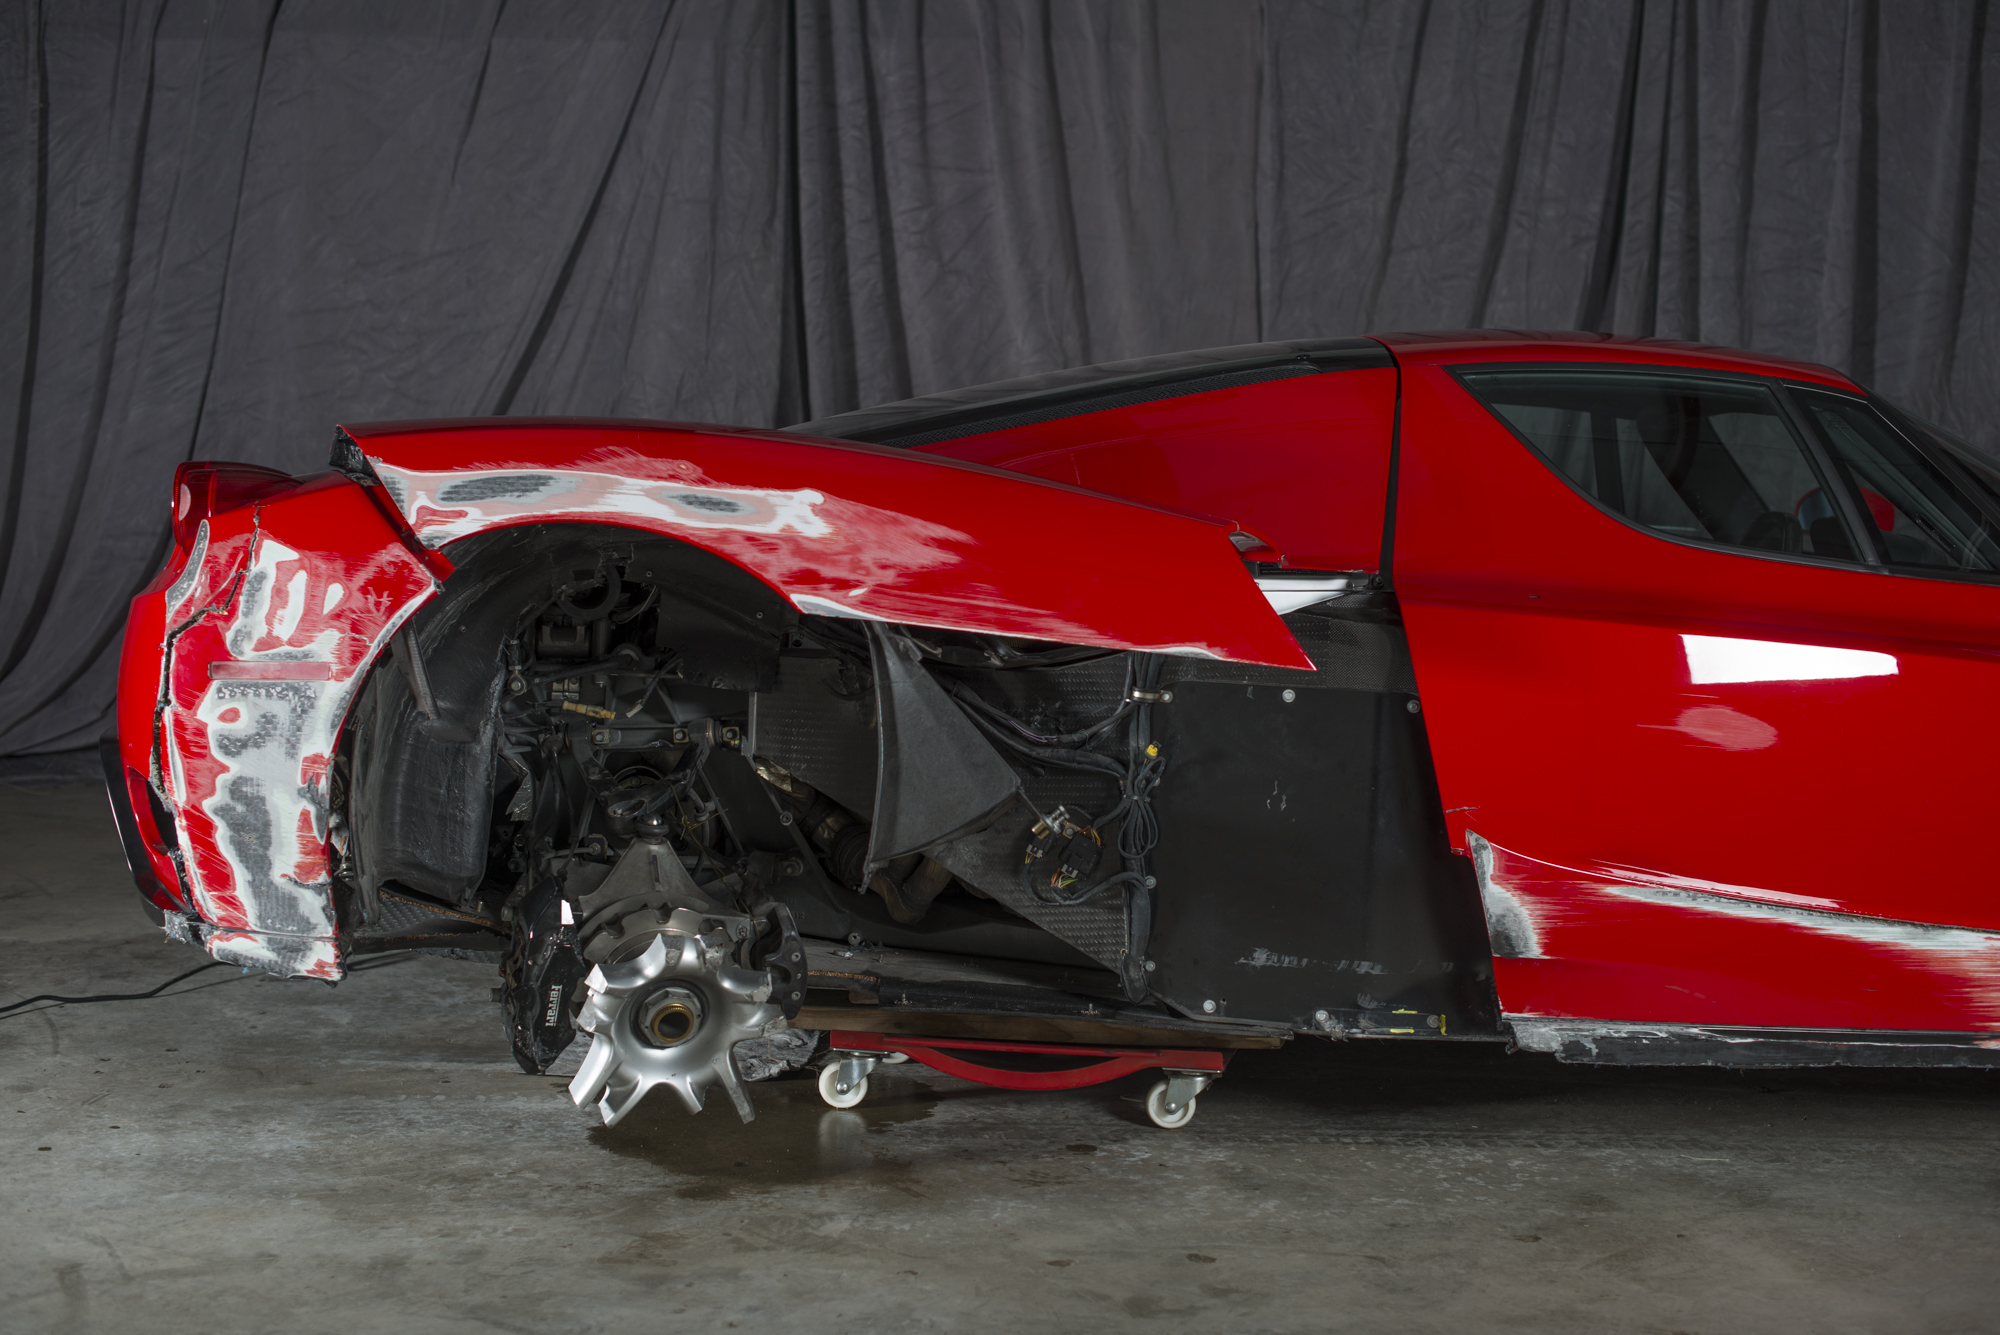 Ferrari Enzo Supercar Damage